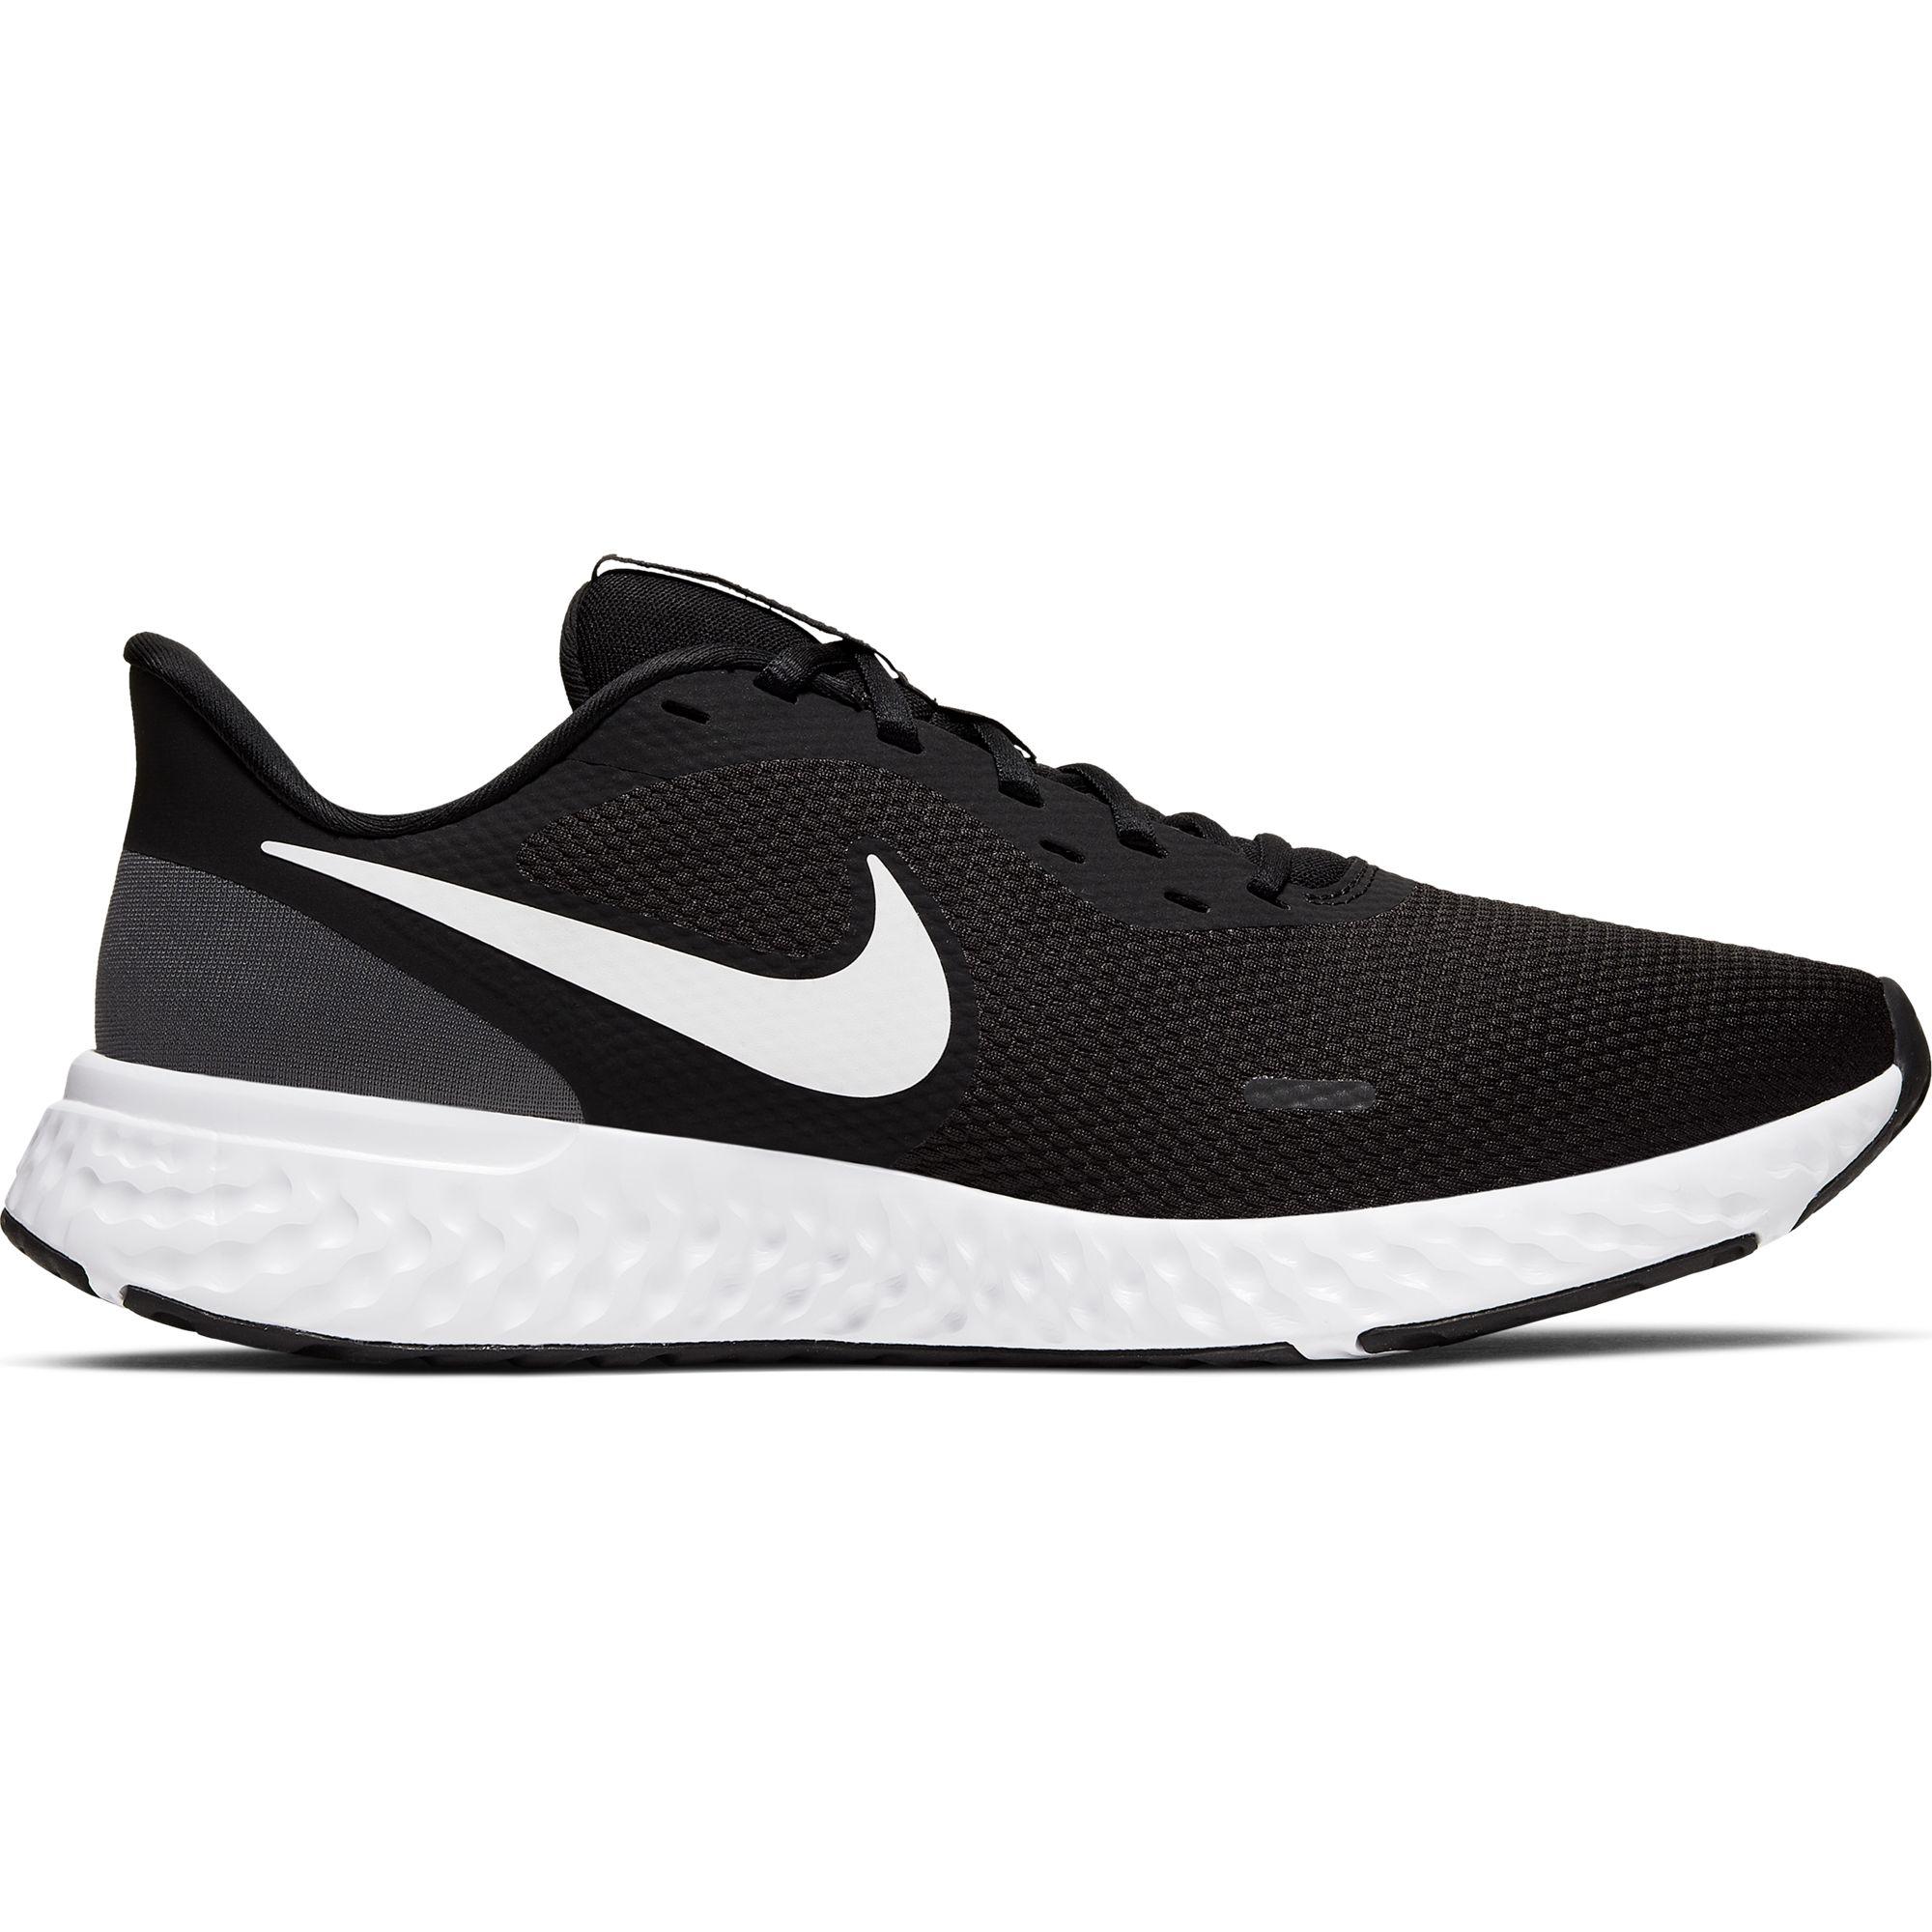 Men's Revolution 5 Running Shoes, Black/White, swatch